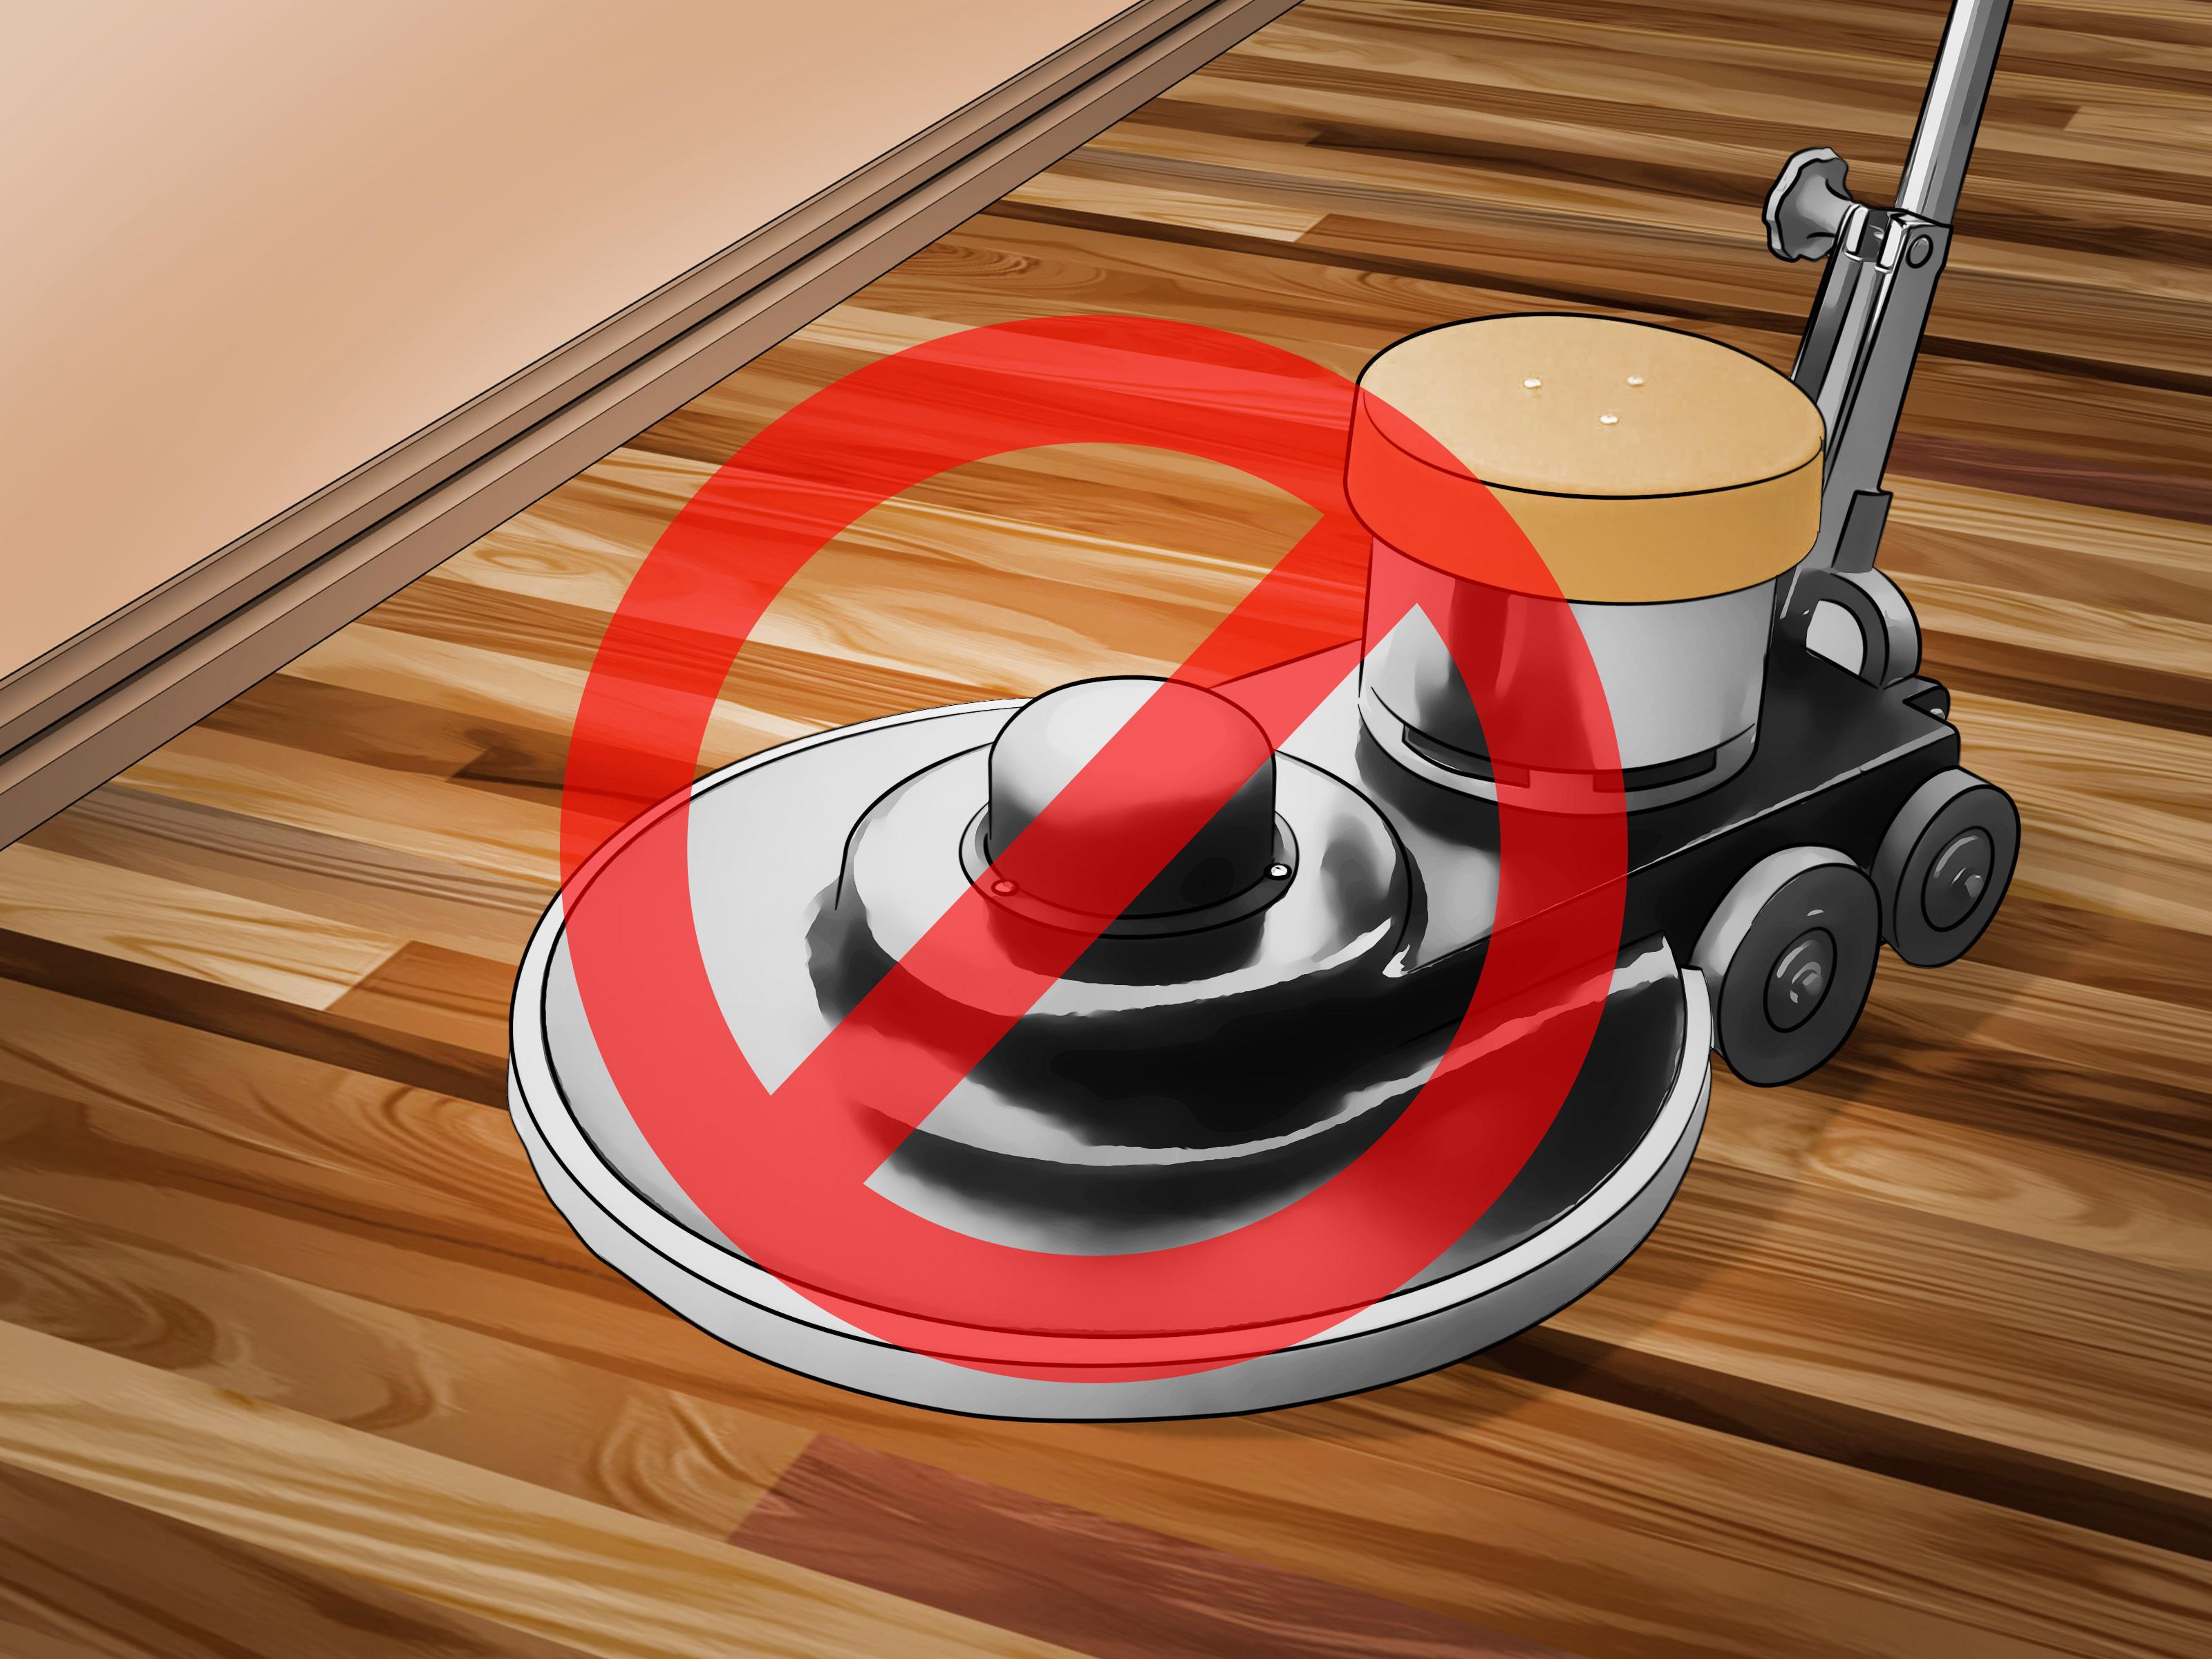 hardwood floor installation process of 4 ways to clean polyurethane wood floors wikihow inside clean polyurethane wood floors step 15